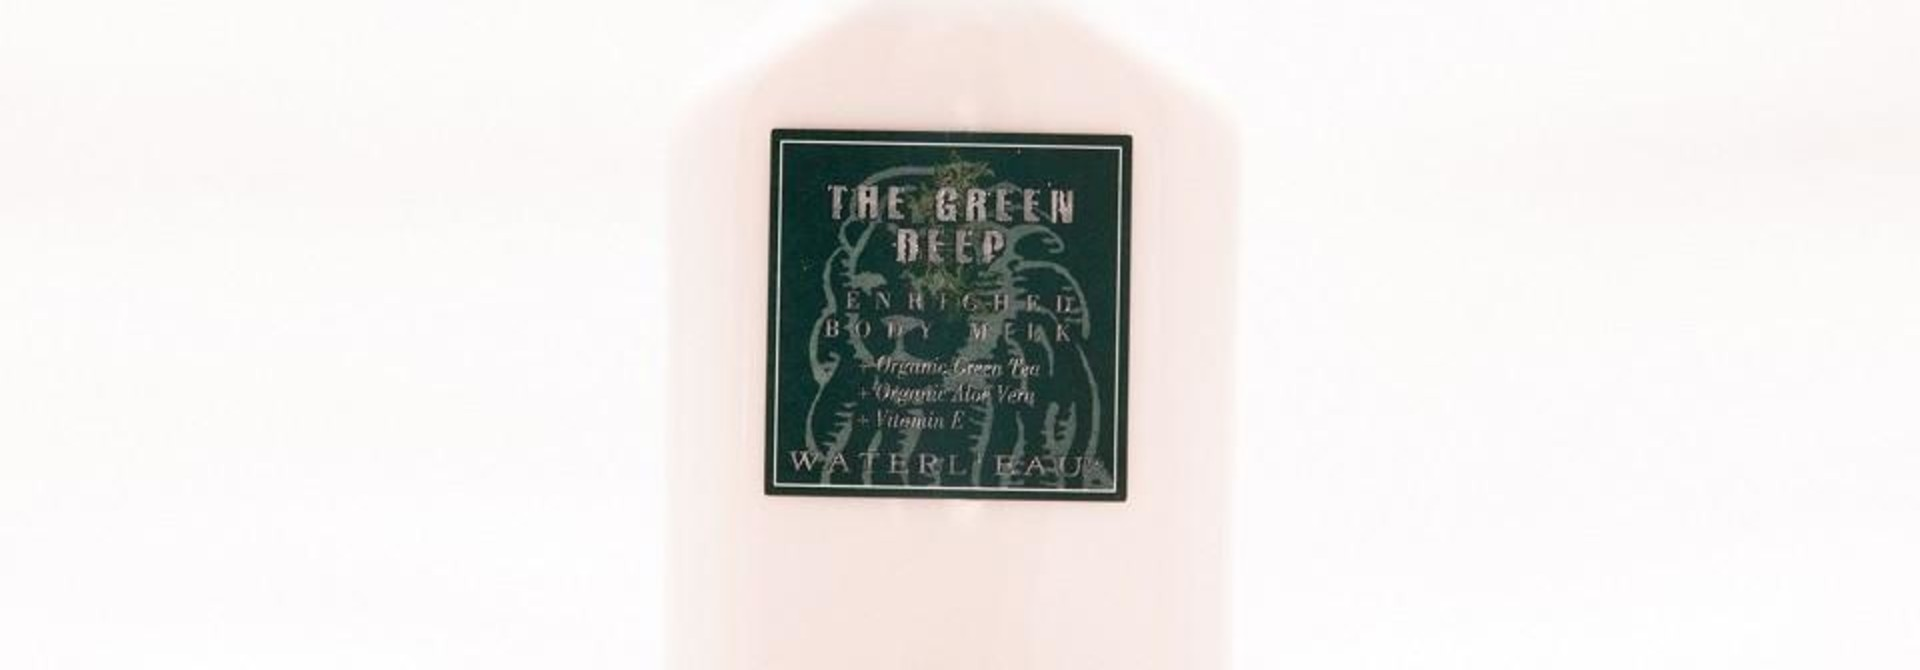 The Green Deep - Body Milk